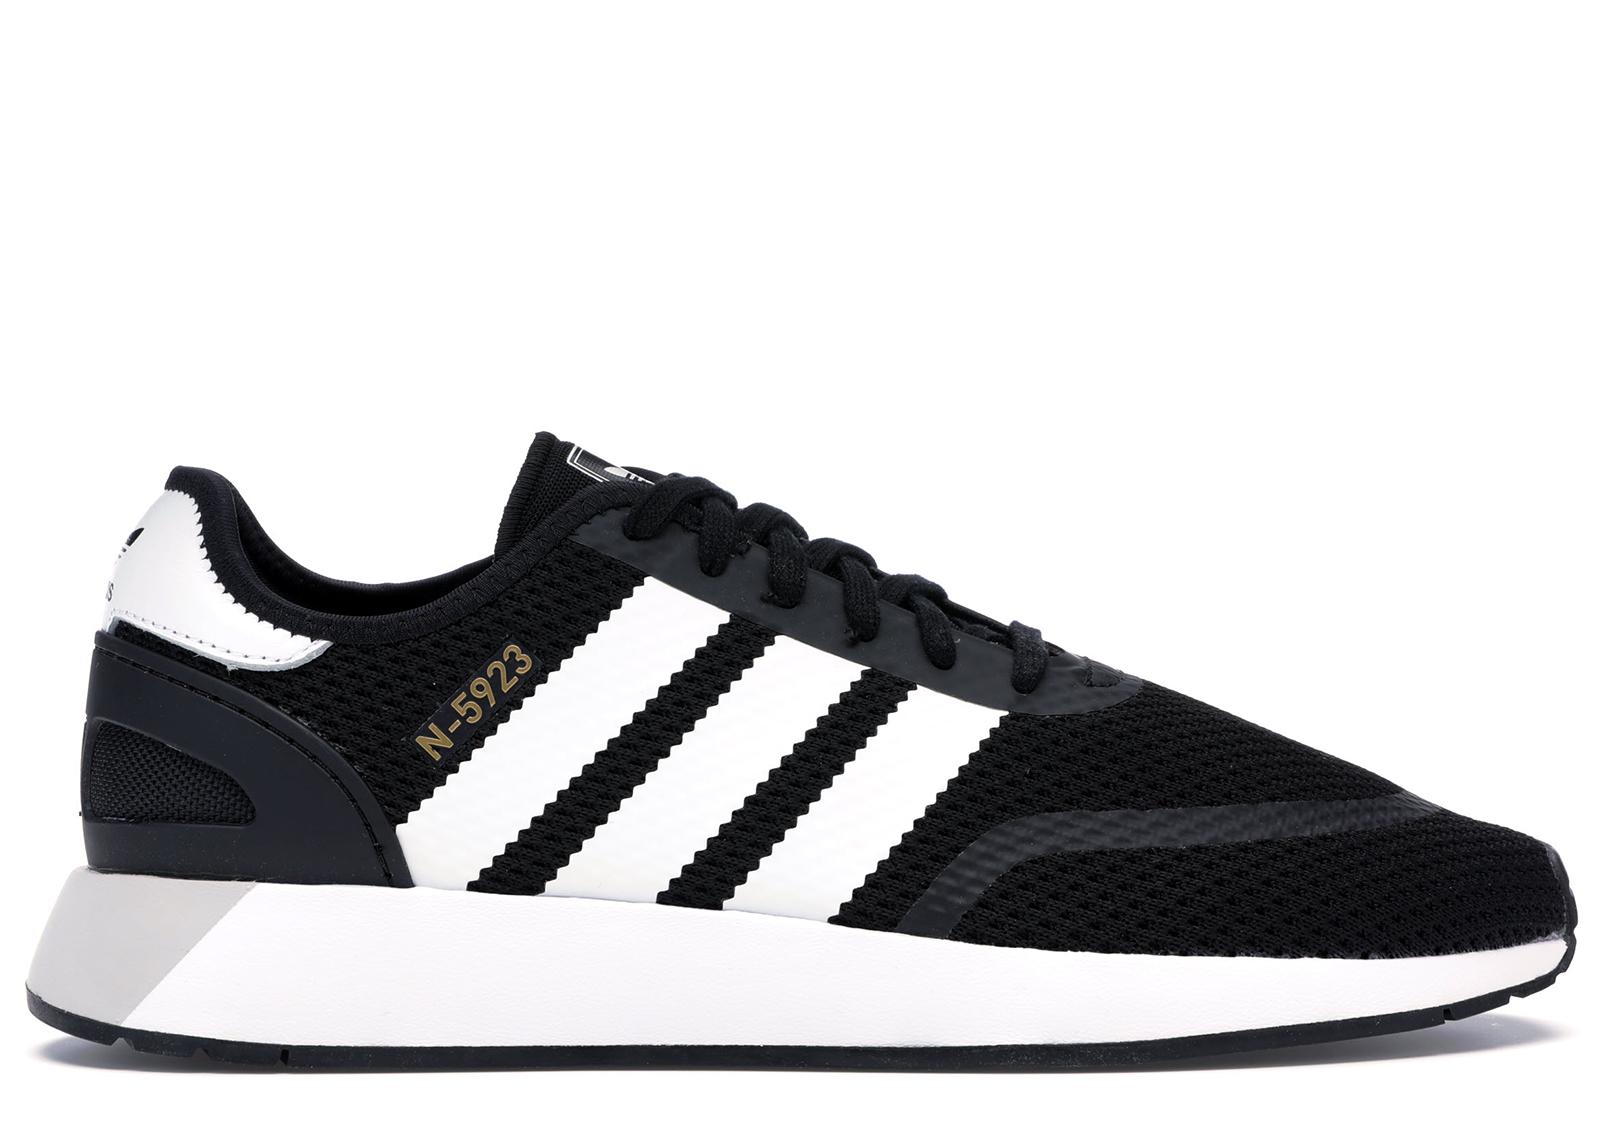 adidas N-5923 Black White - CQ2337